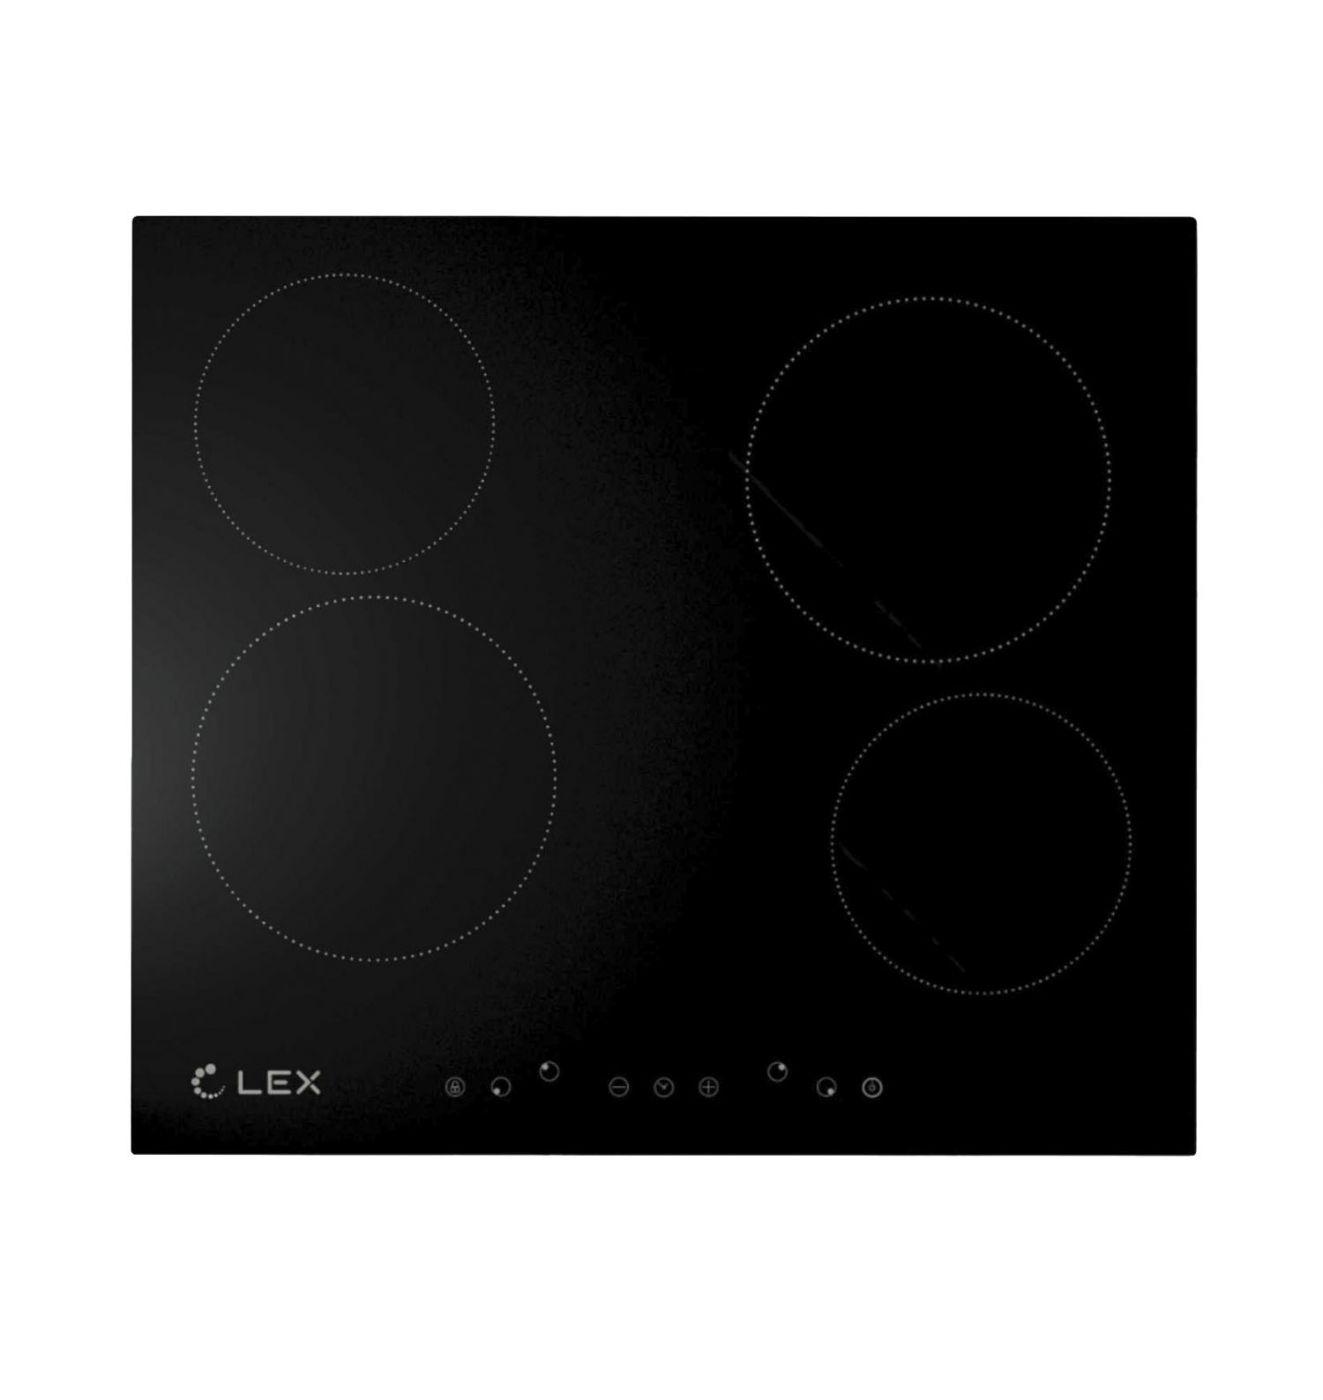 Электрическая варочная панель LEX EVH 640 BL (CHYO000173)